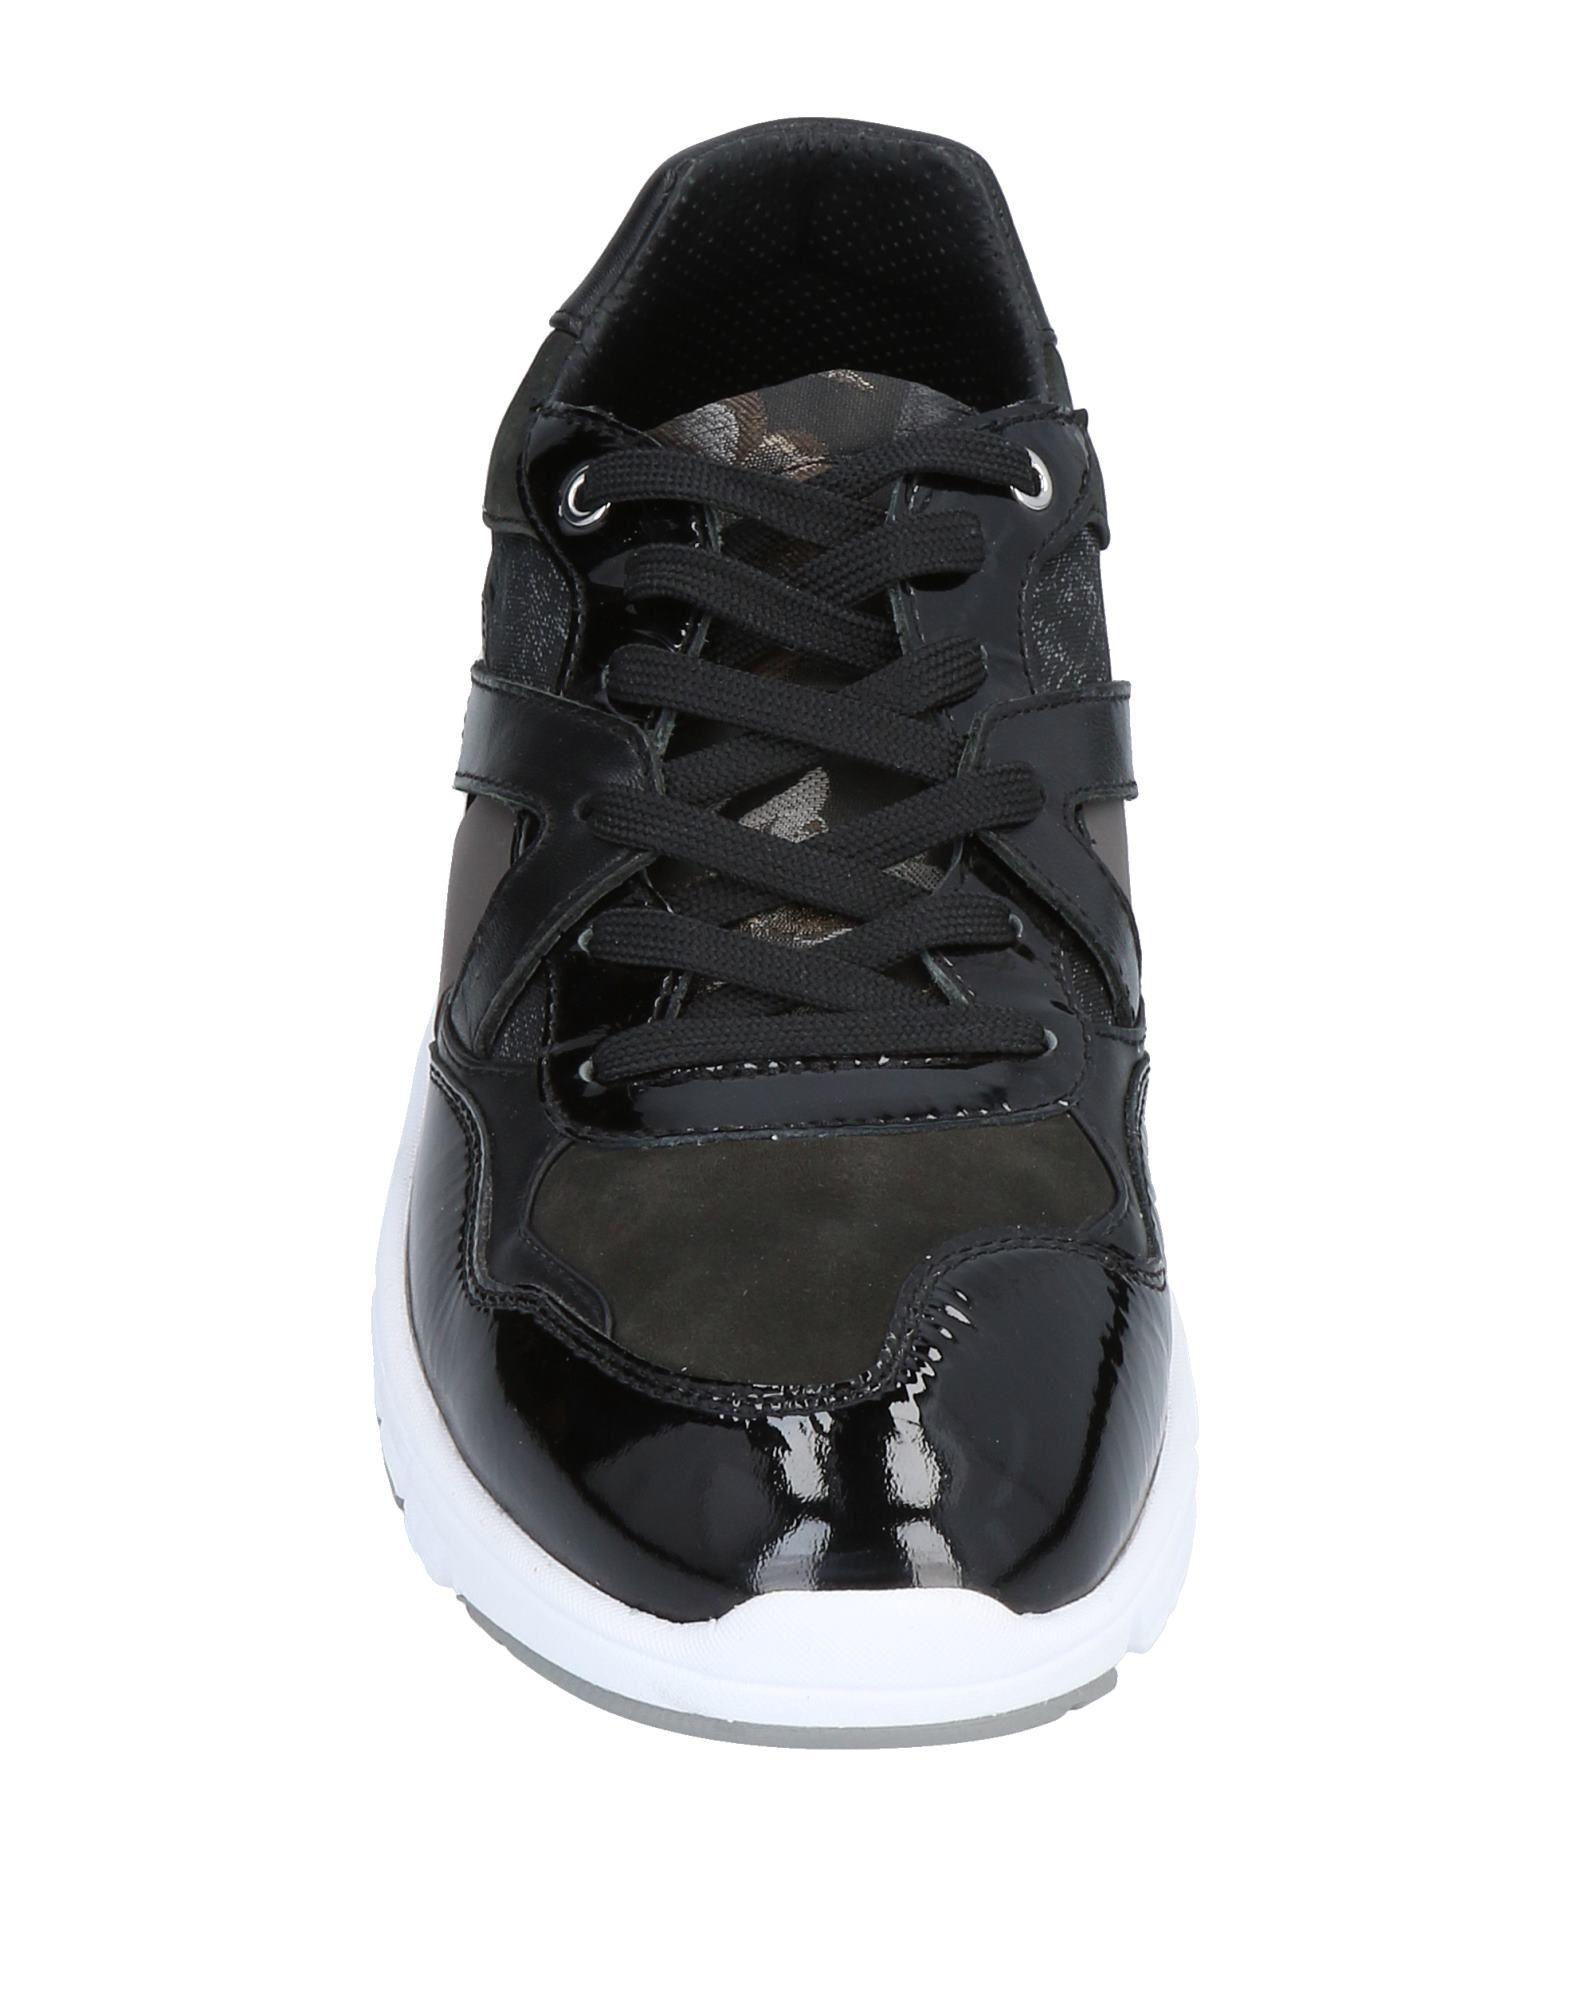 Dolce & Gabbana Sneakers Neue Herren  11473650TI Neue Sneakers Schuhe 483602